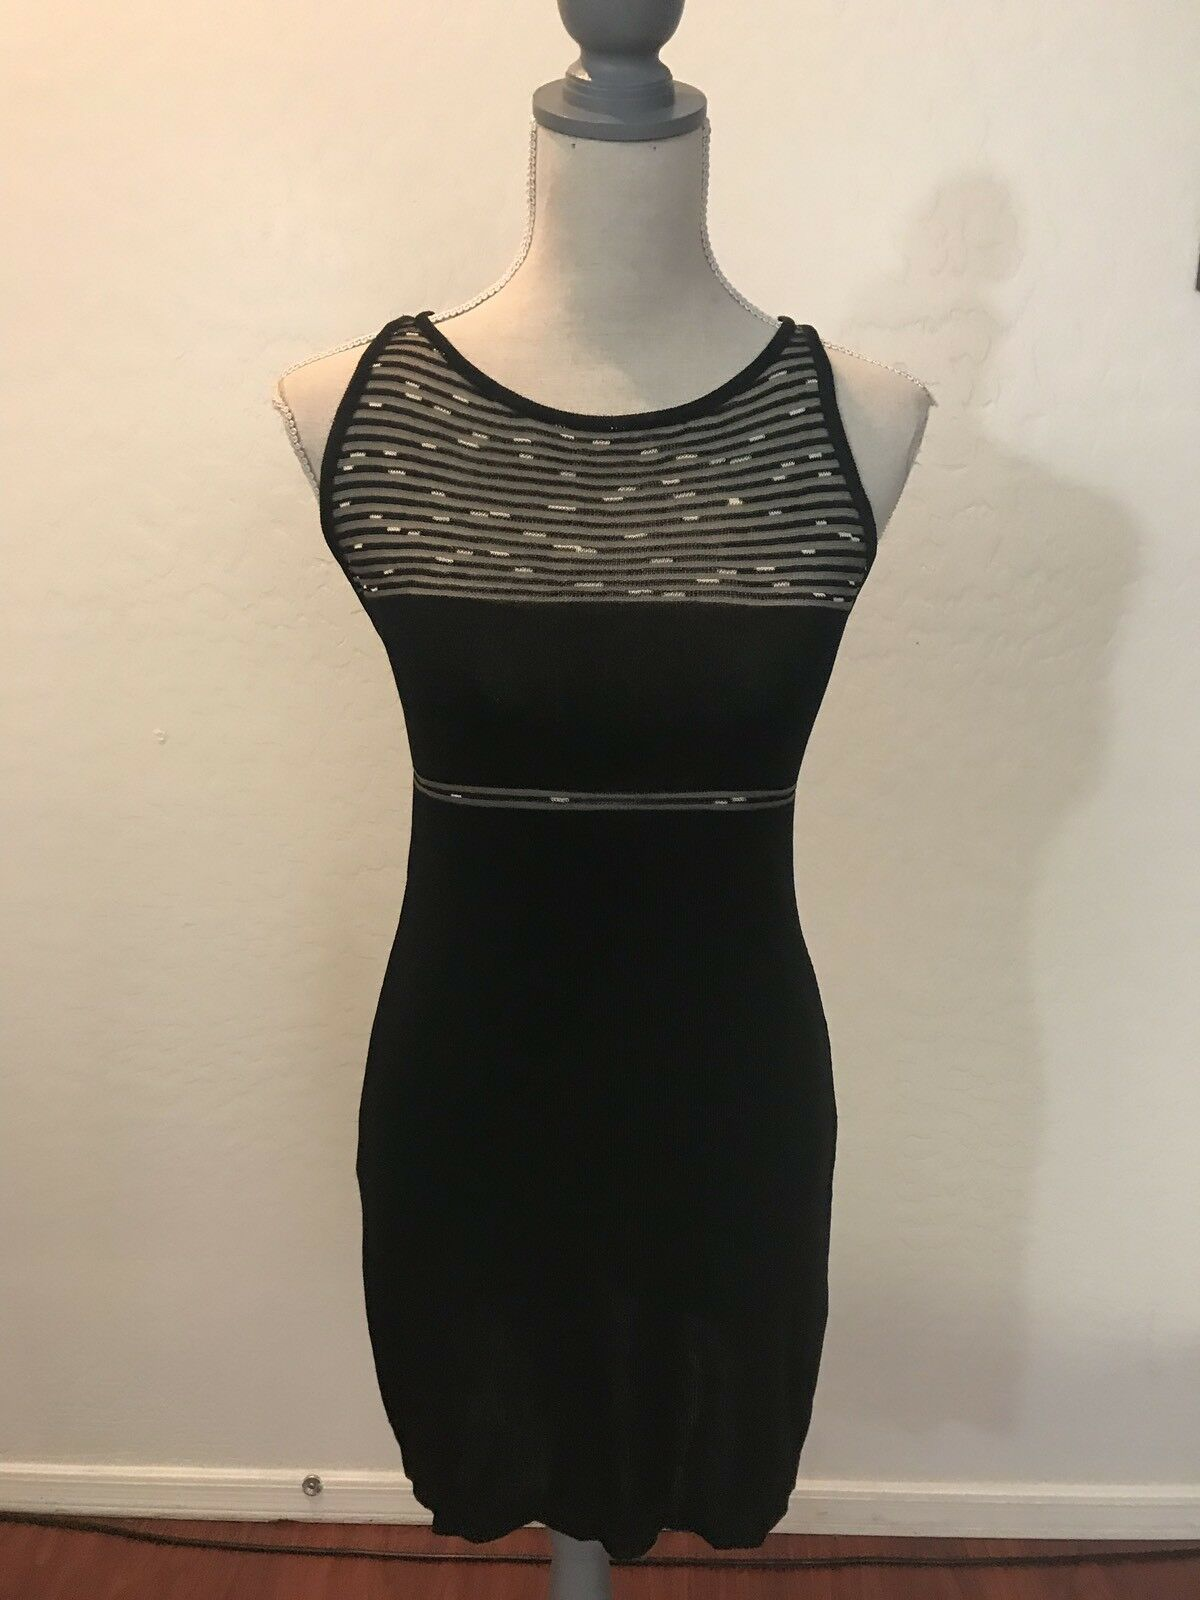 Nora Attalai Paris Mini Knit Dress Size P